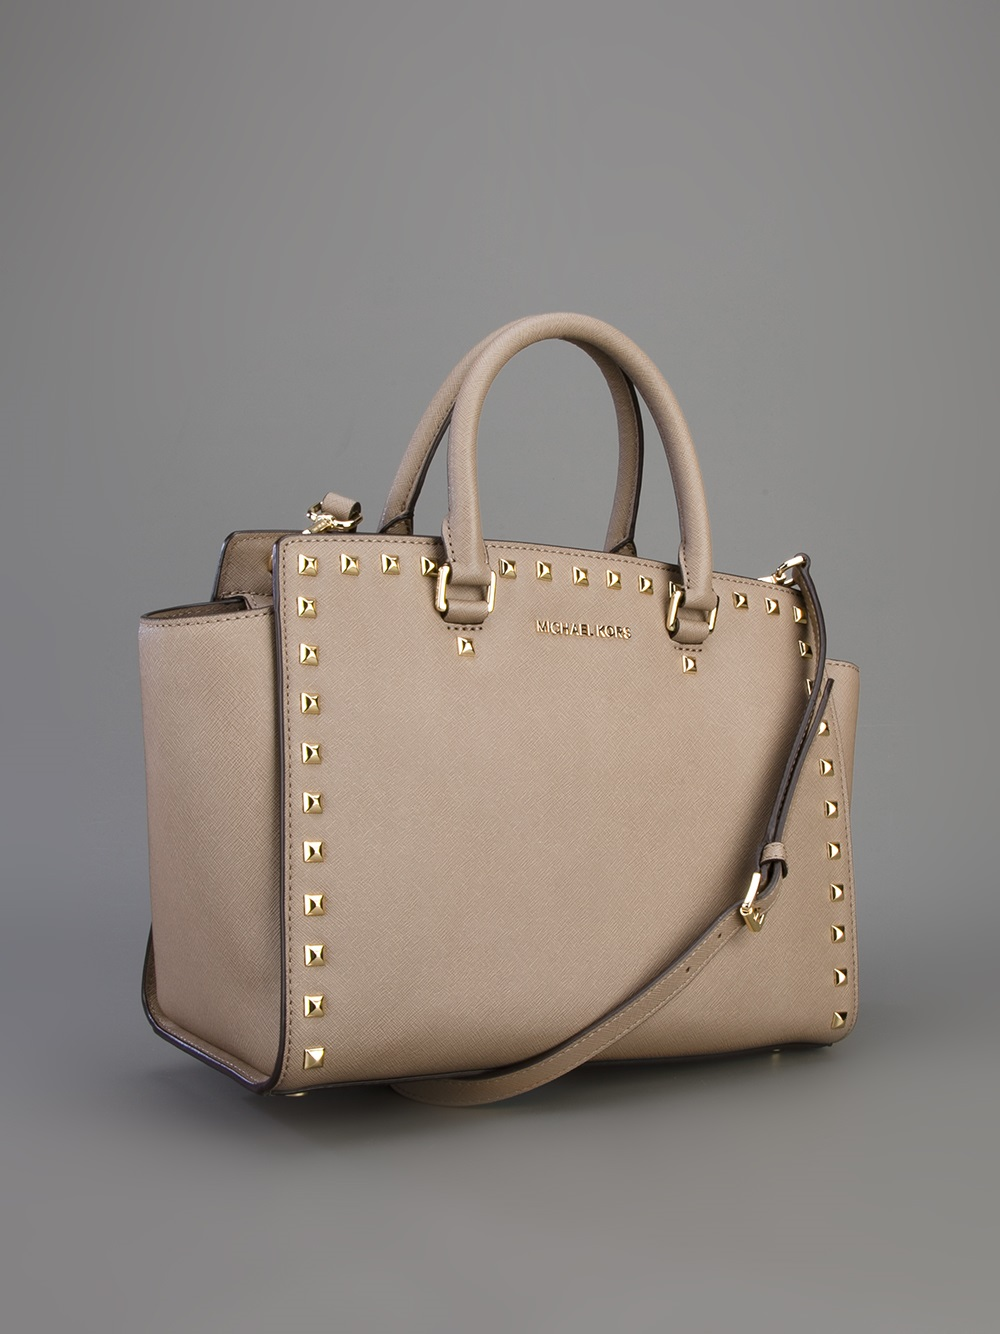 060625185dd6 ... germany lyst michael michael kors selma studded satchel in metallic  a23c3 16a76